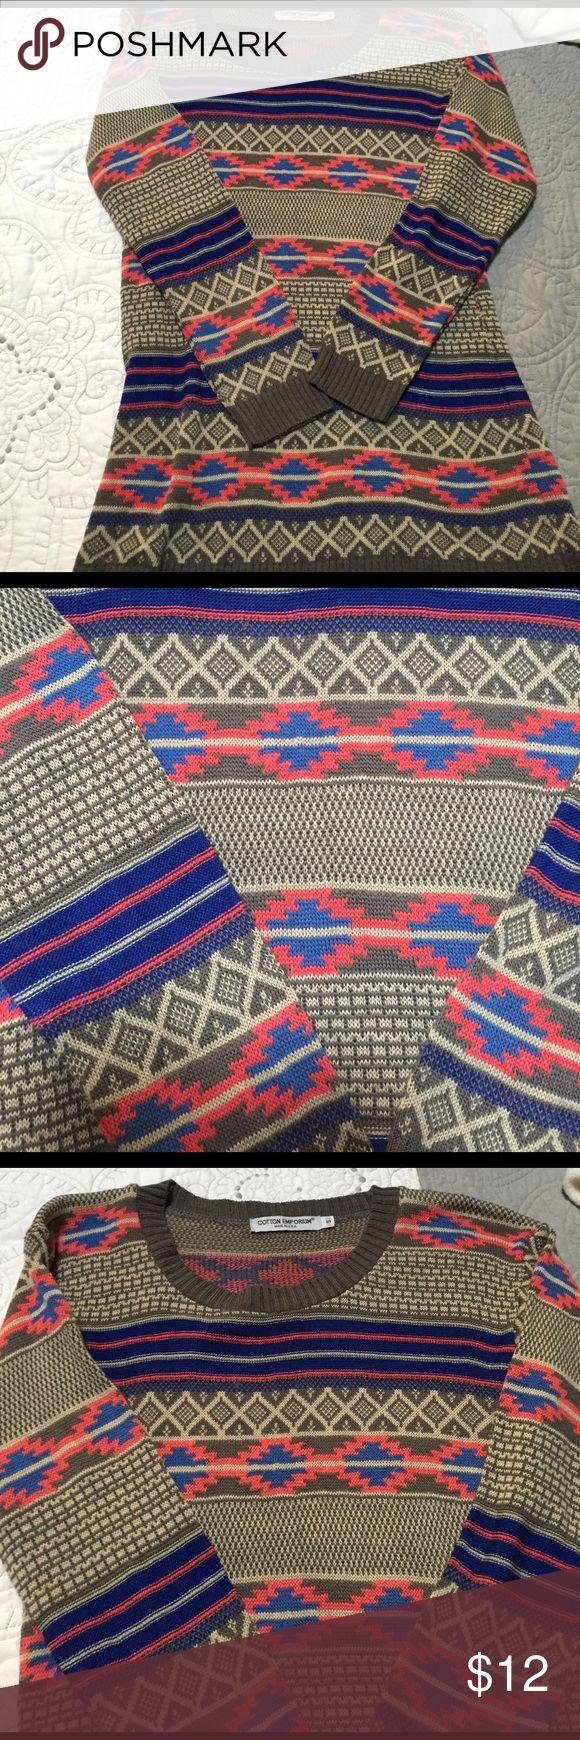 Cotton Emporium sweater Size small. Tribal print sweater. Worn once cotton emporium Sweaters